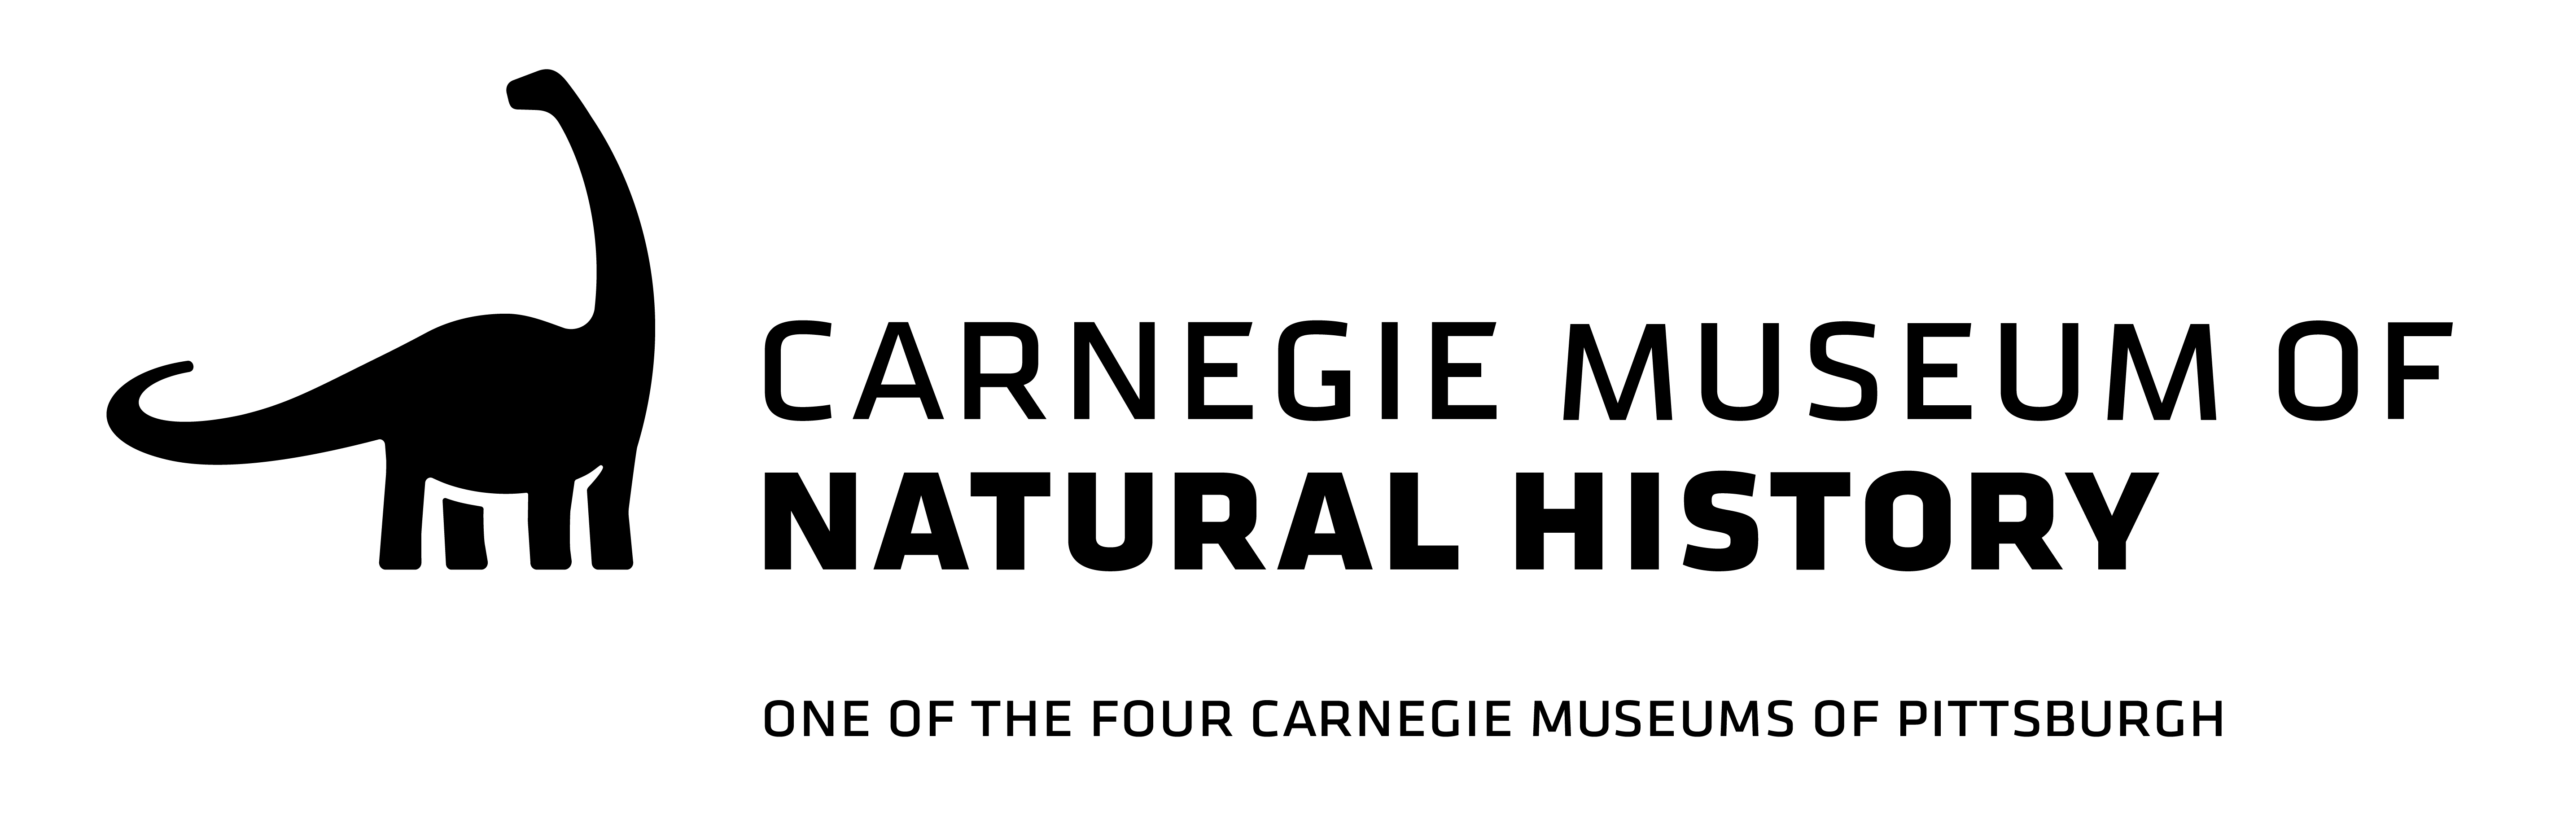 CMNH_Horizontal-Two-Line-Logo